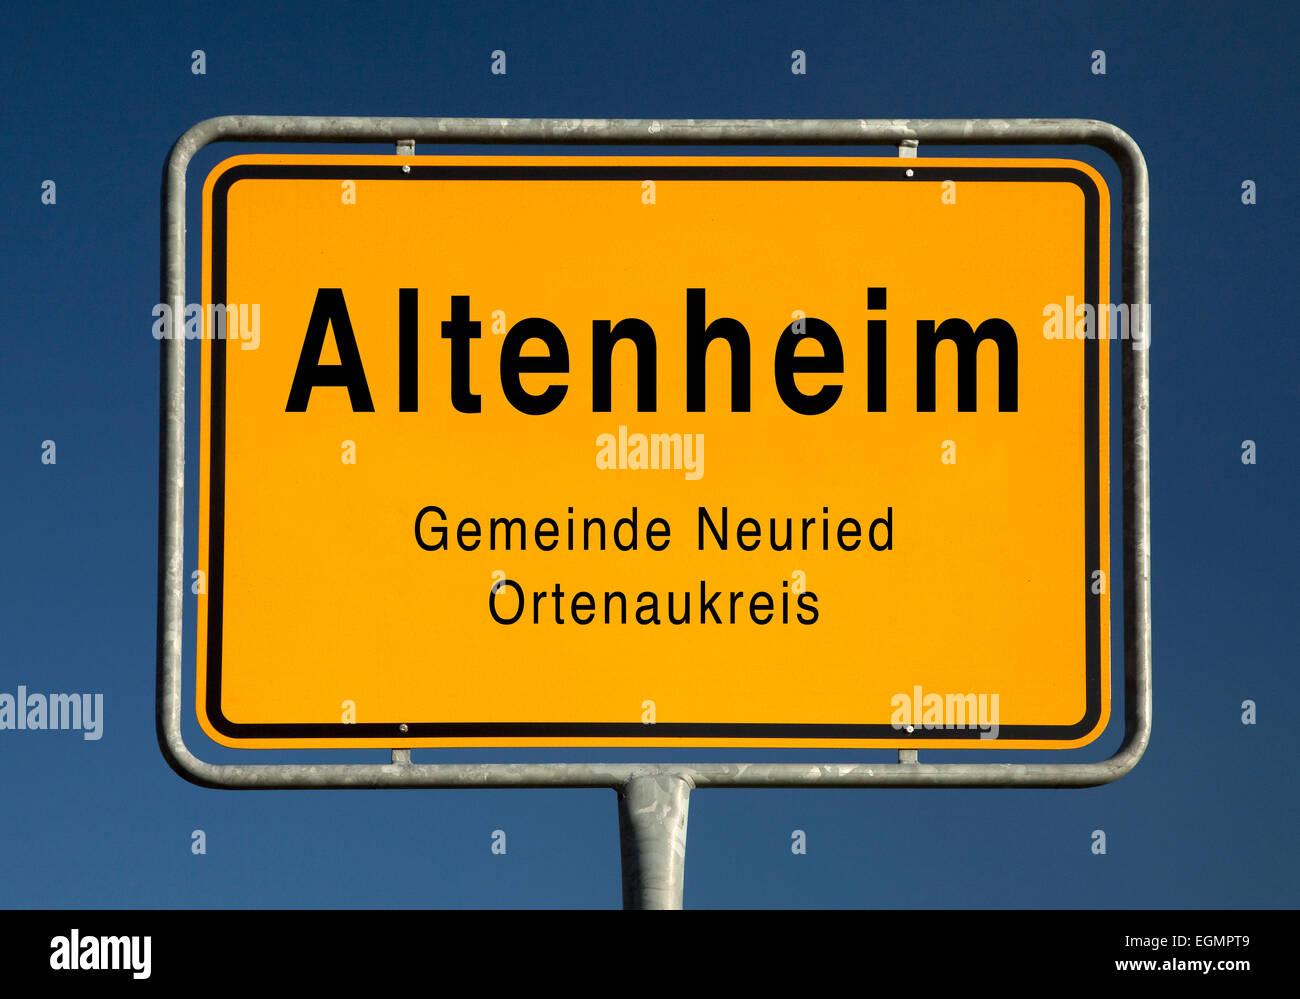 City limits sign of Altenheim, part of Neuried, Ortenaukreis, Baden-Württemberg, Germany Stock Photo